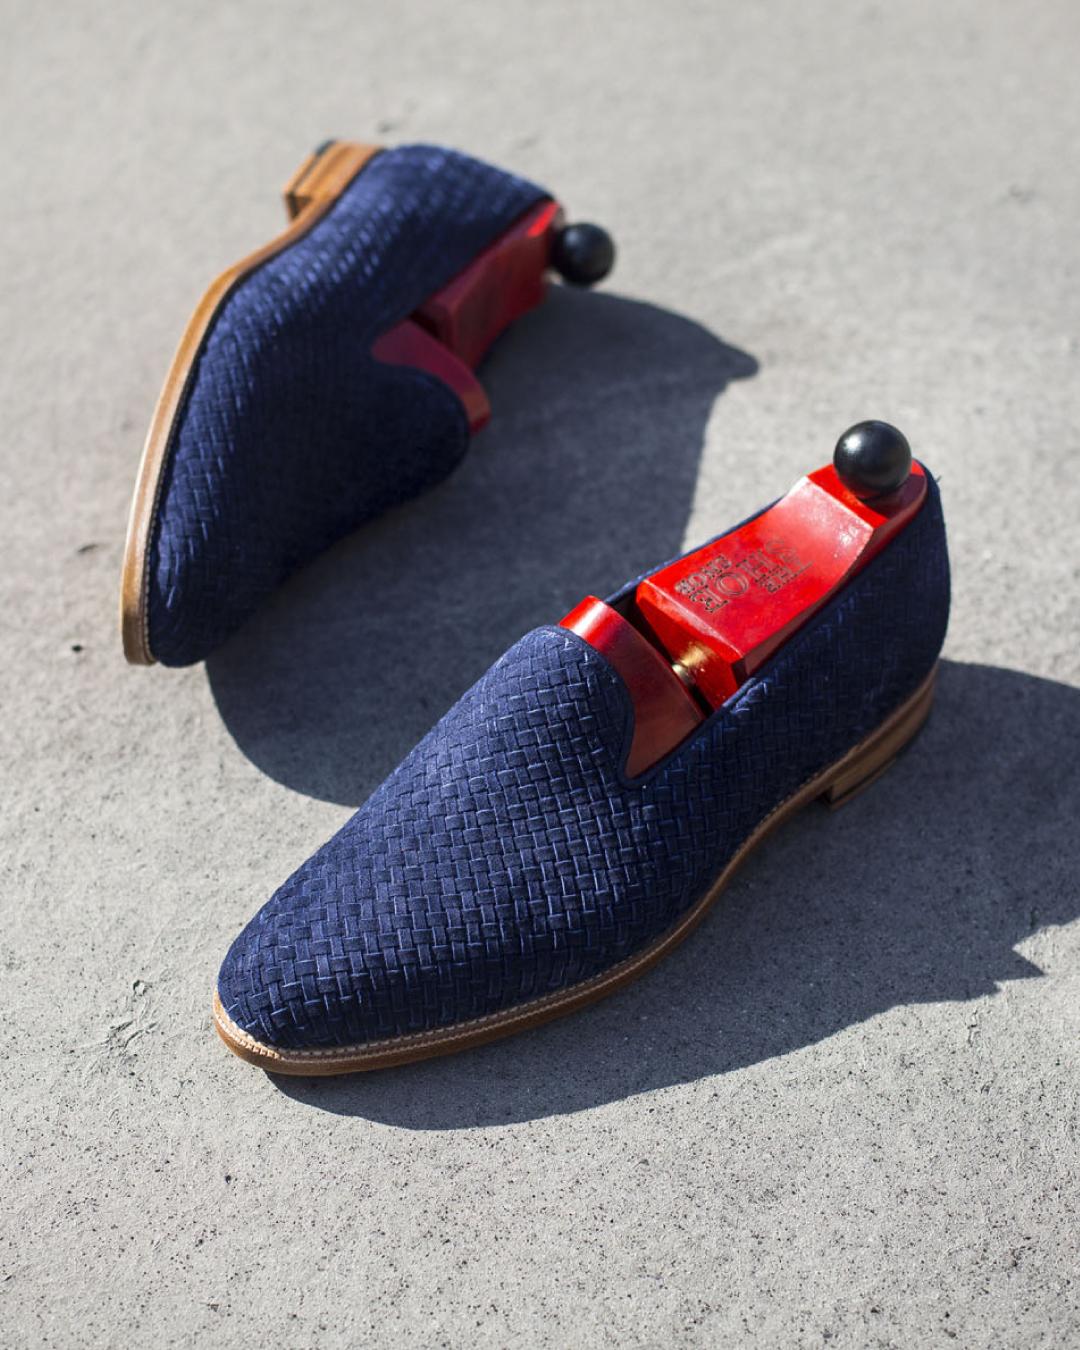 j-fitzpatrick-footwear-banner-loafer-instagram-1-2019.jpg